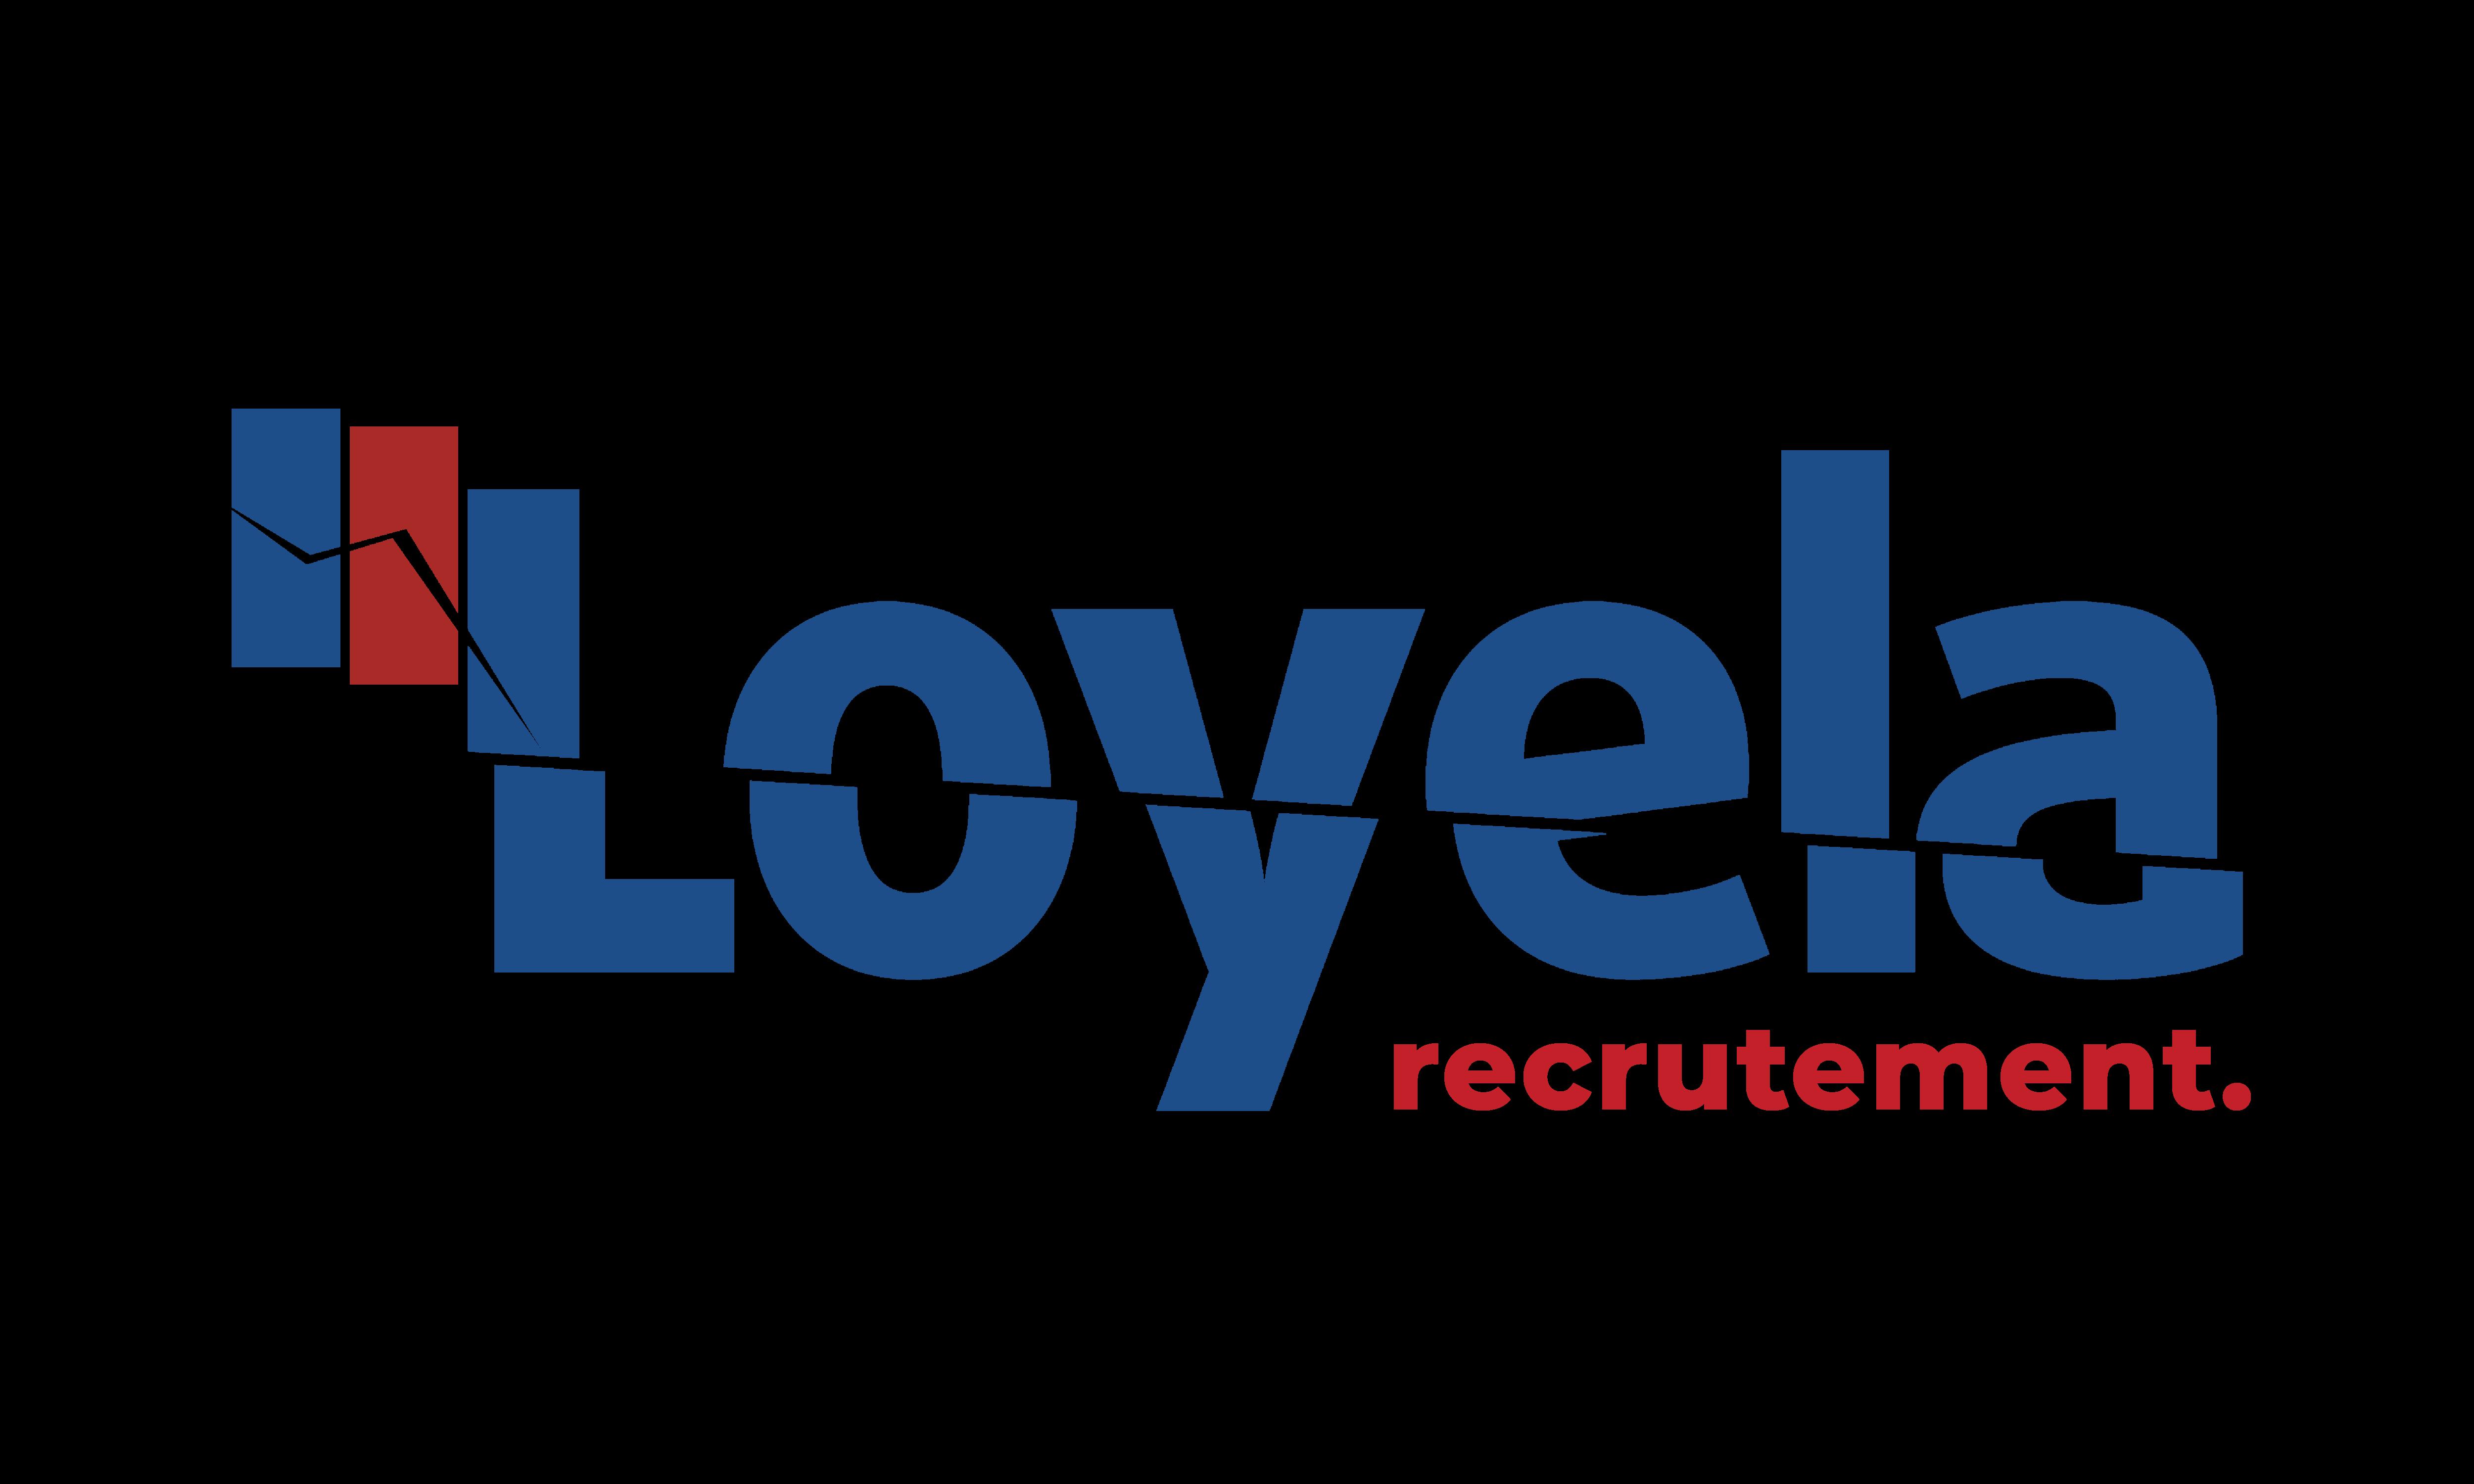 Loyela Recrutement